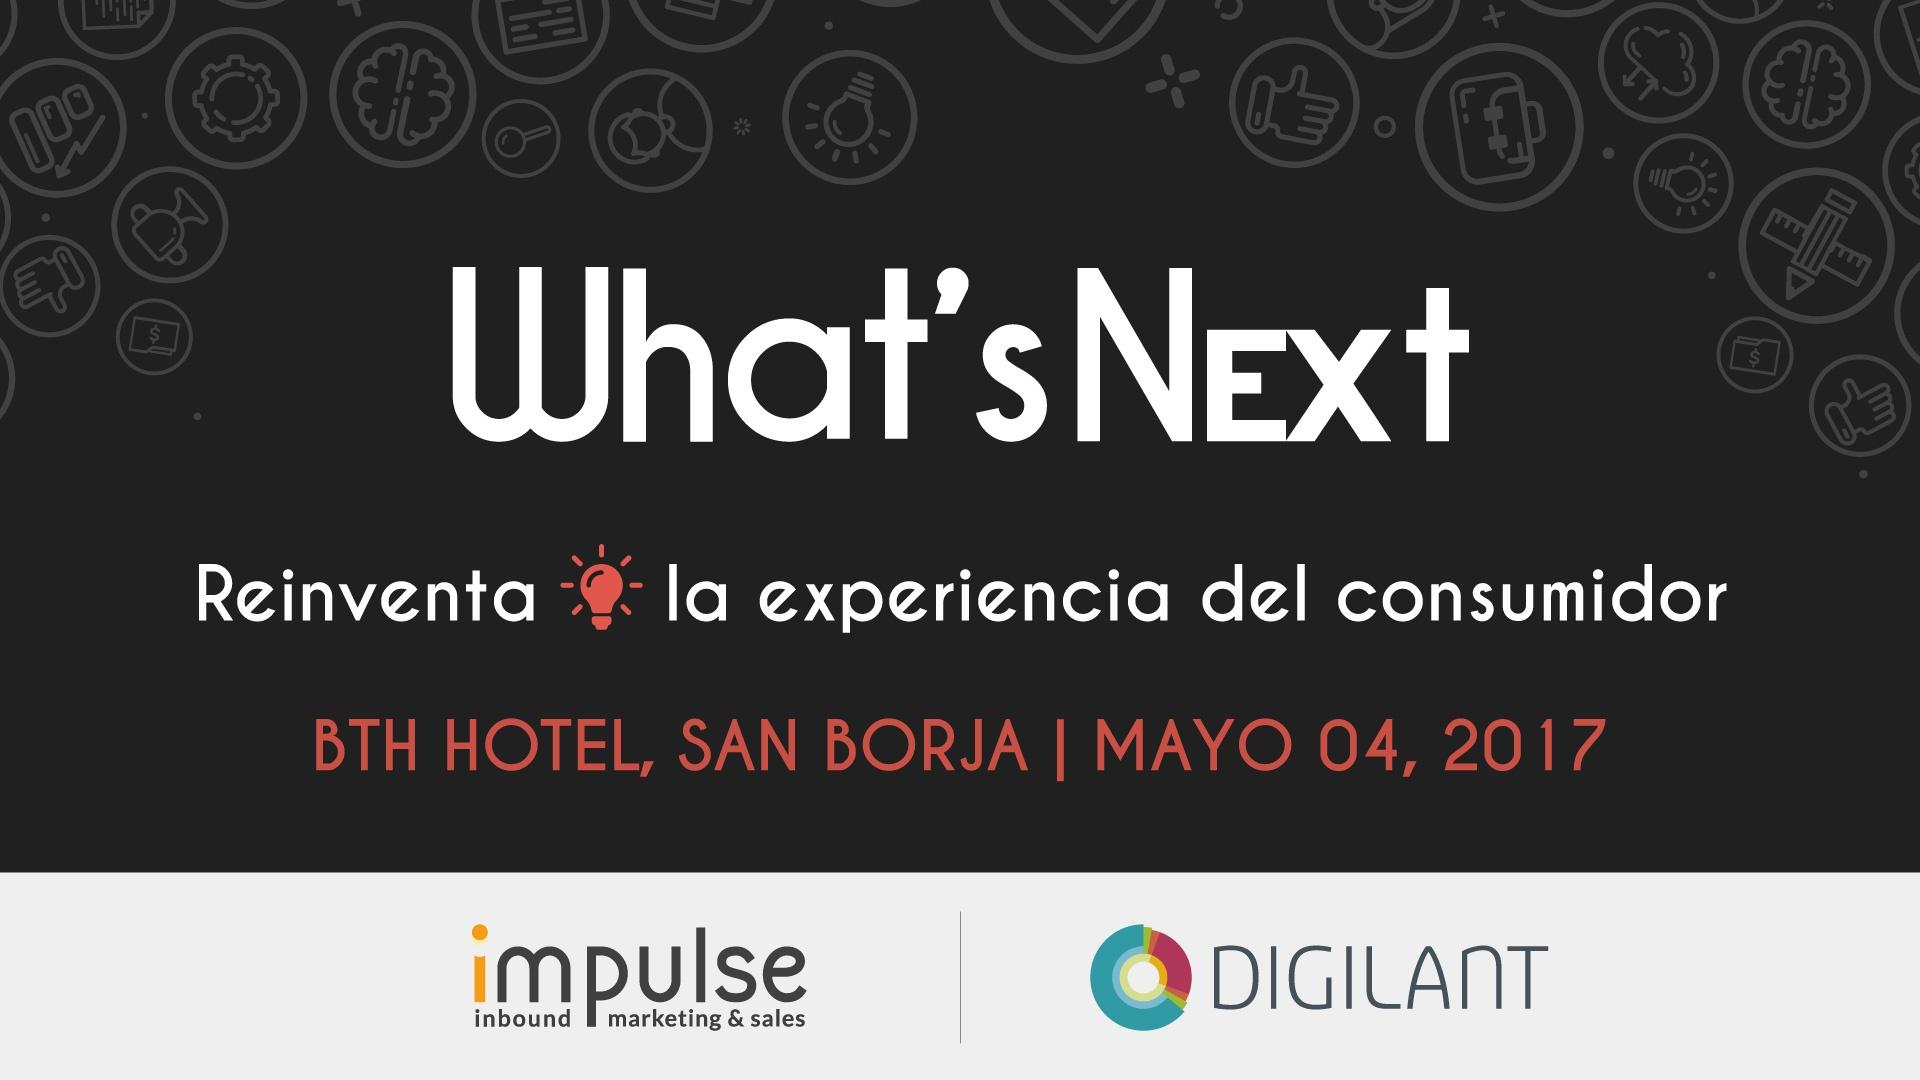 promocion-whats-next-reinventa-experiencia-consumidor.jpg